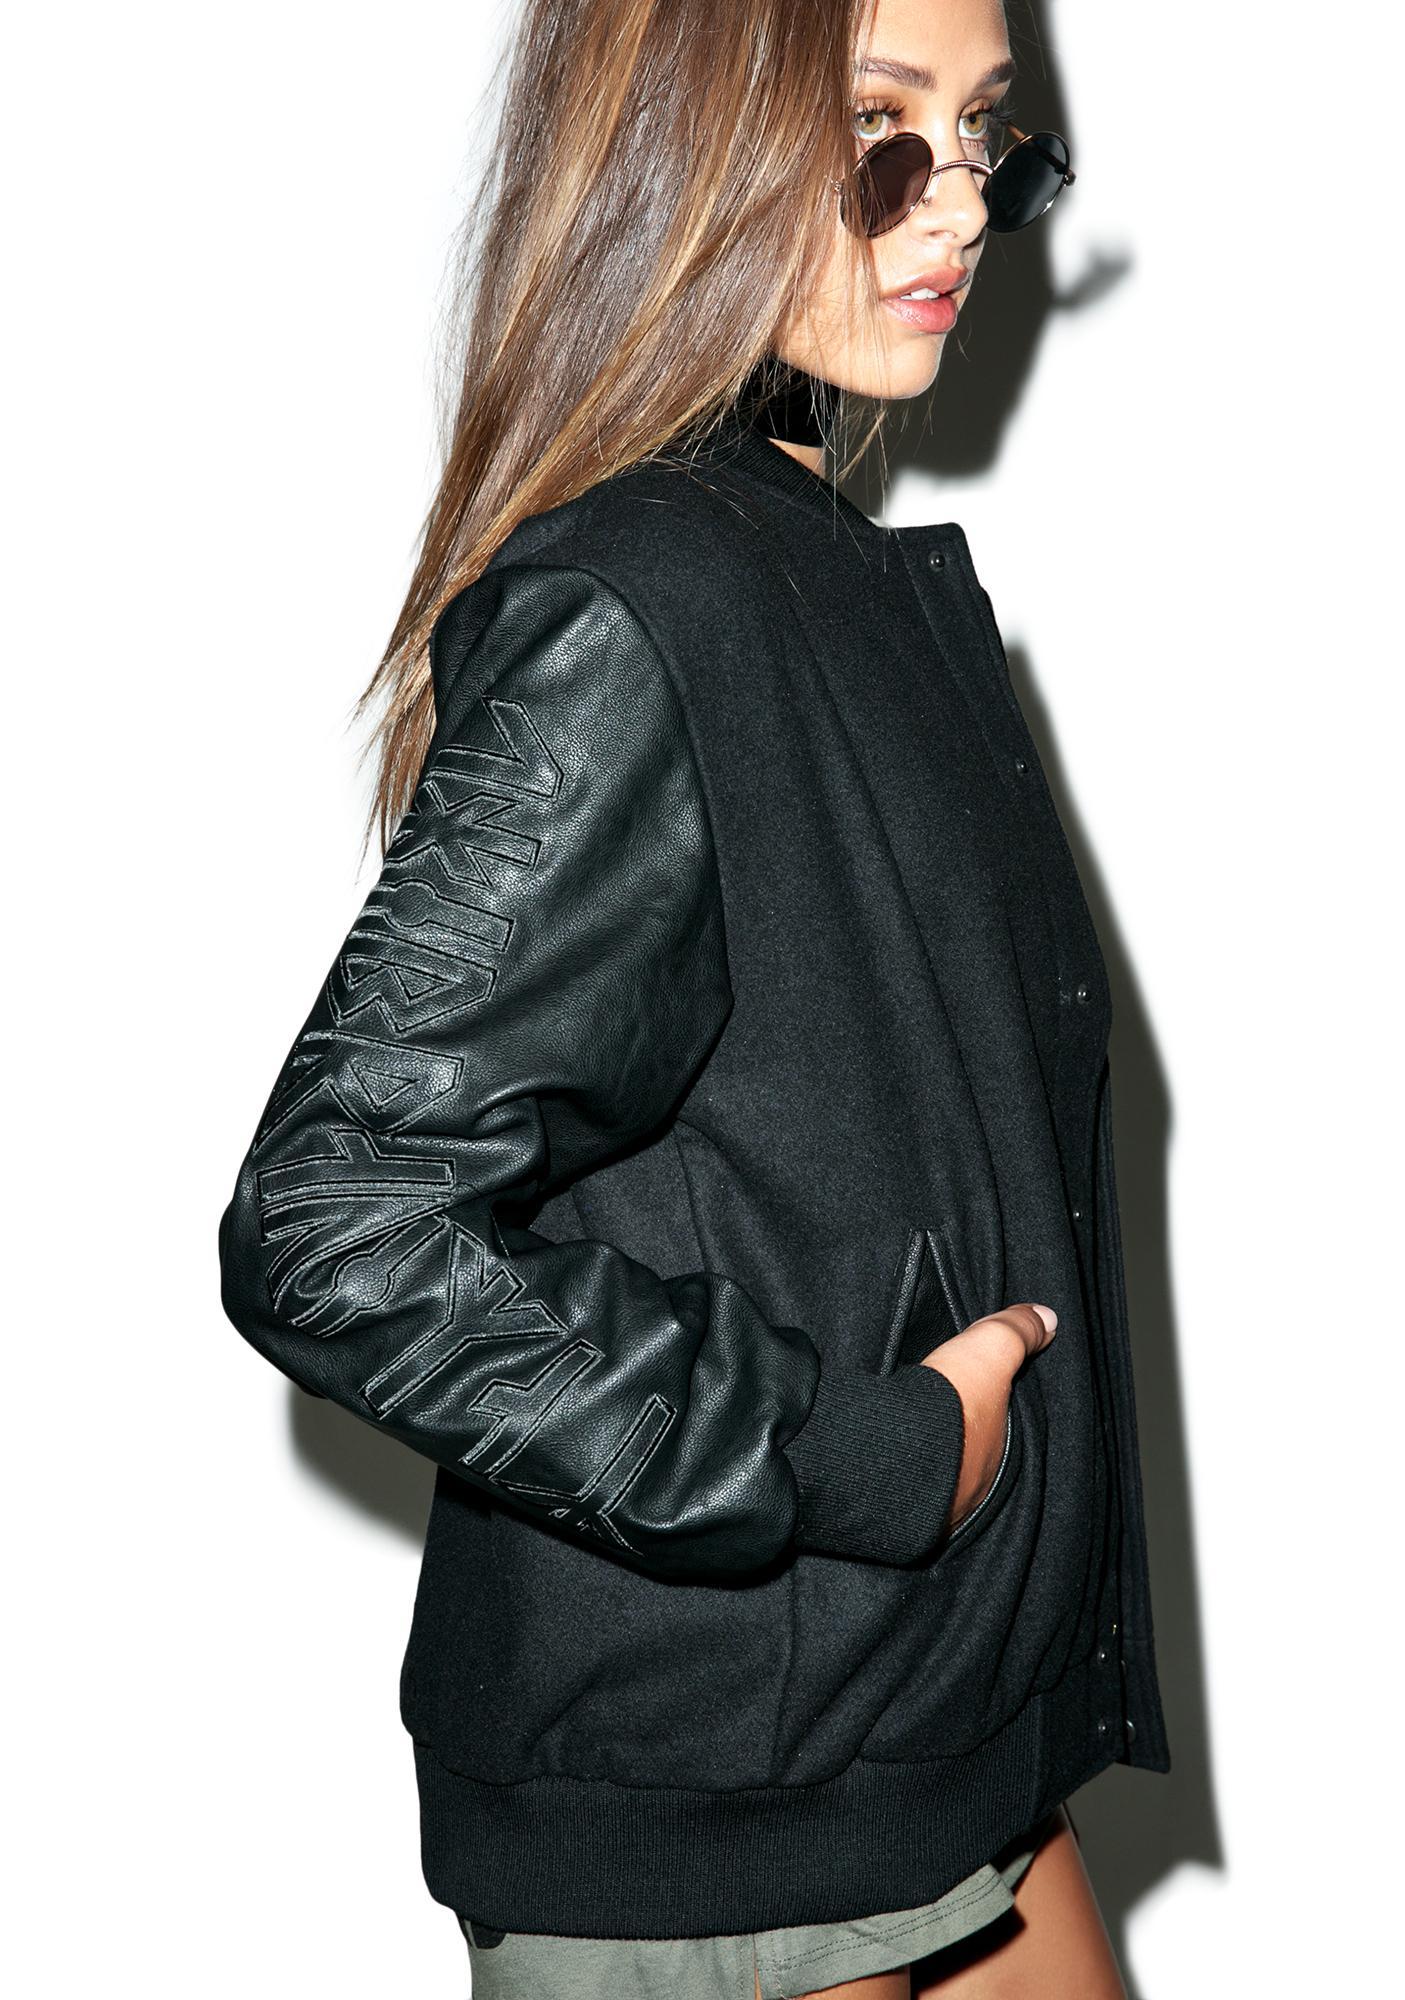 Long Clothing Mishka 2.0 Death Adder Chain Varsity Jacket